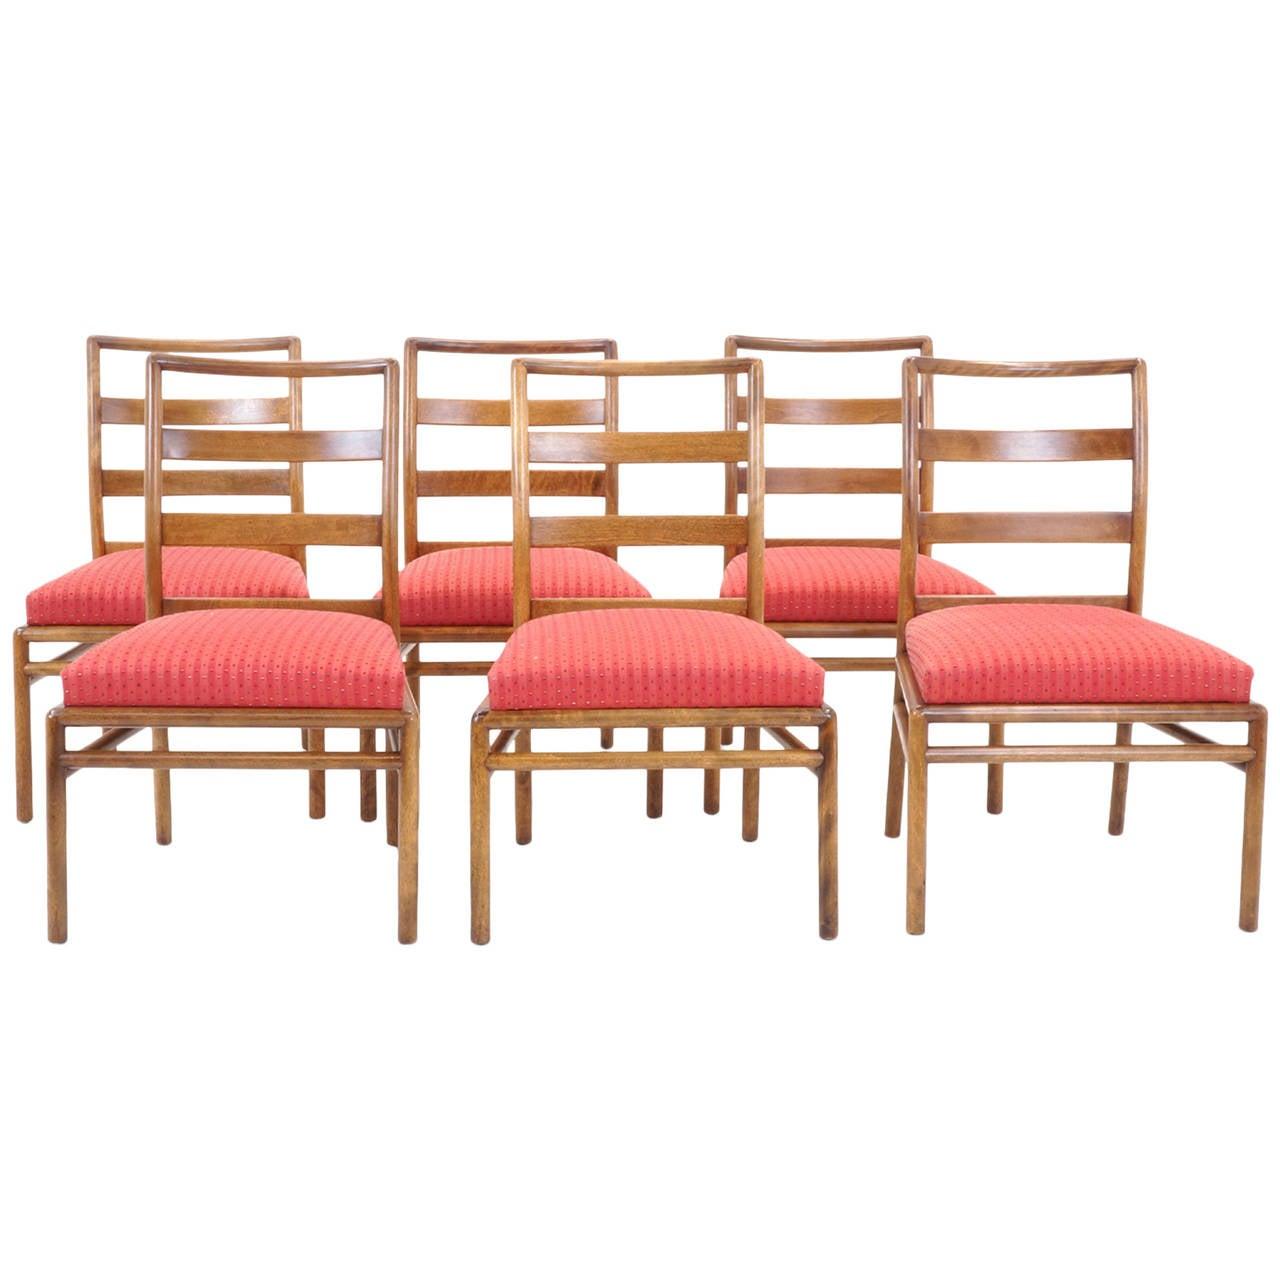 Set of Six Robsjohn-Gibbings for Widdicomb Dining Chairs